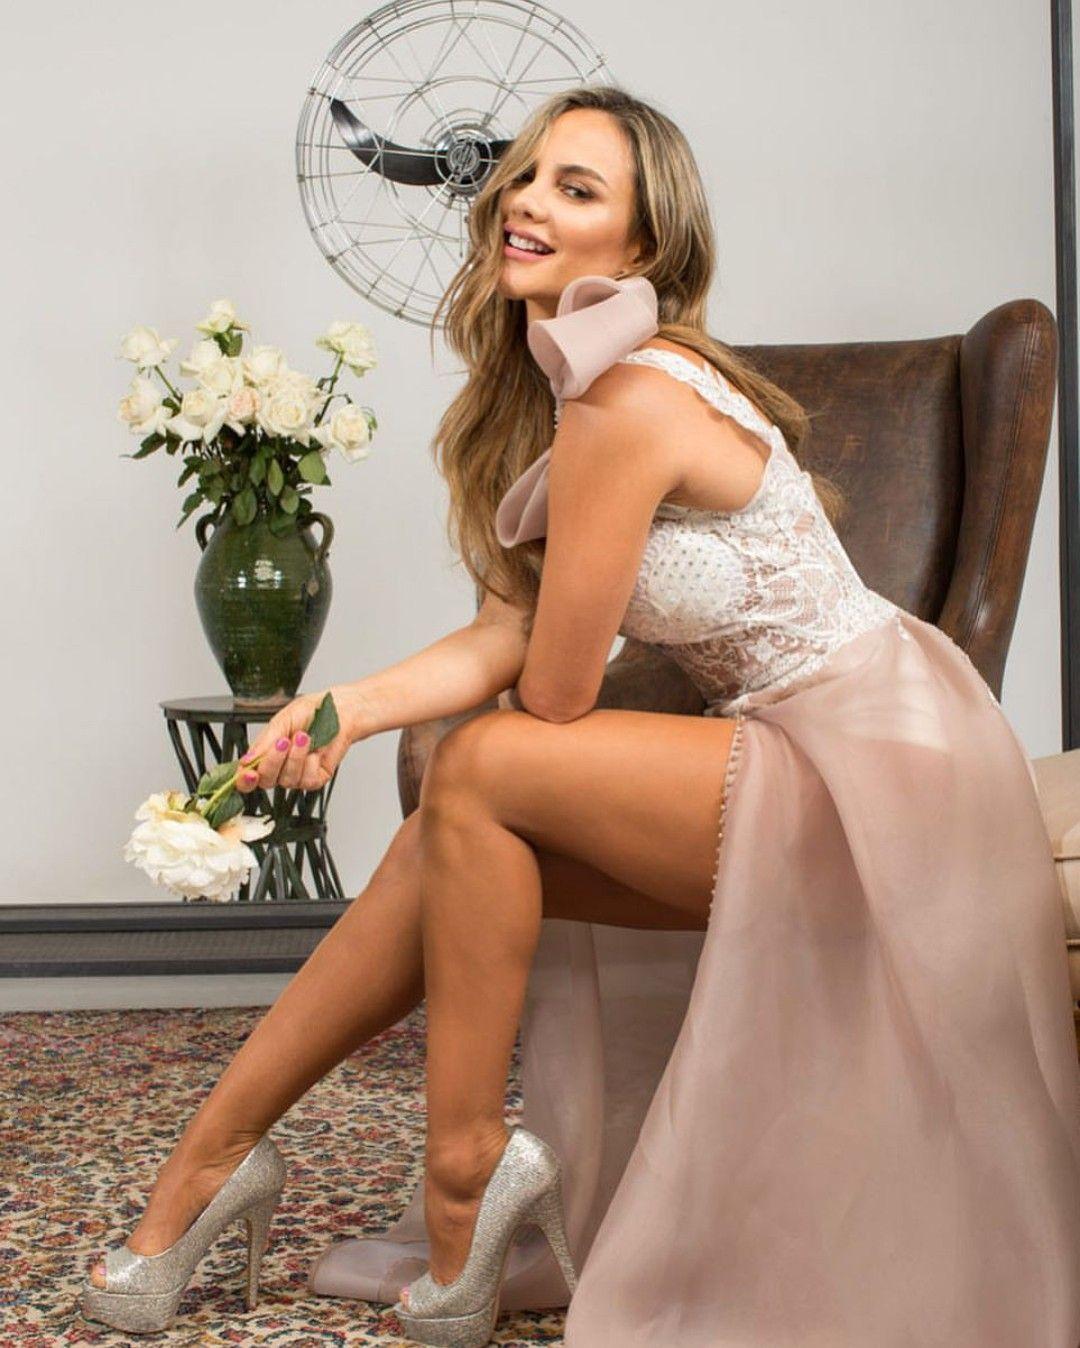 Pussy Ximena Cordoba nudes (46 photos), Sexy, Leaked, Boobs, butt 2015